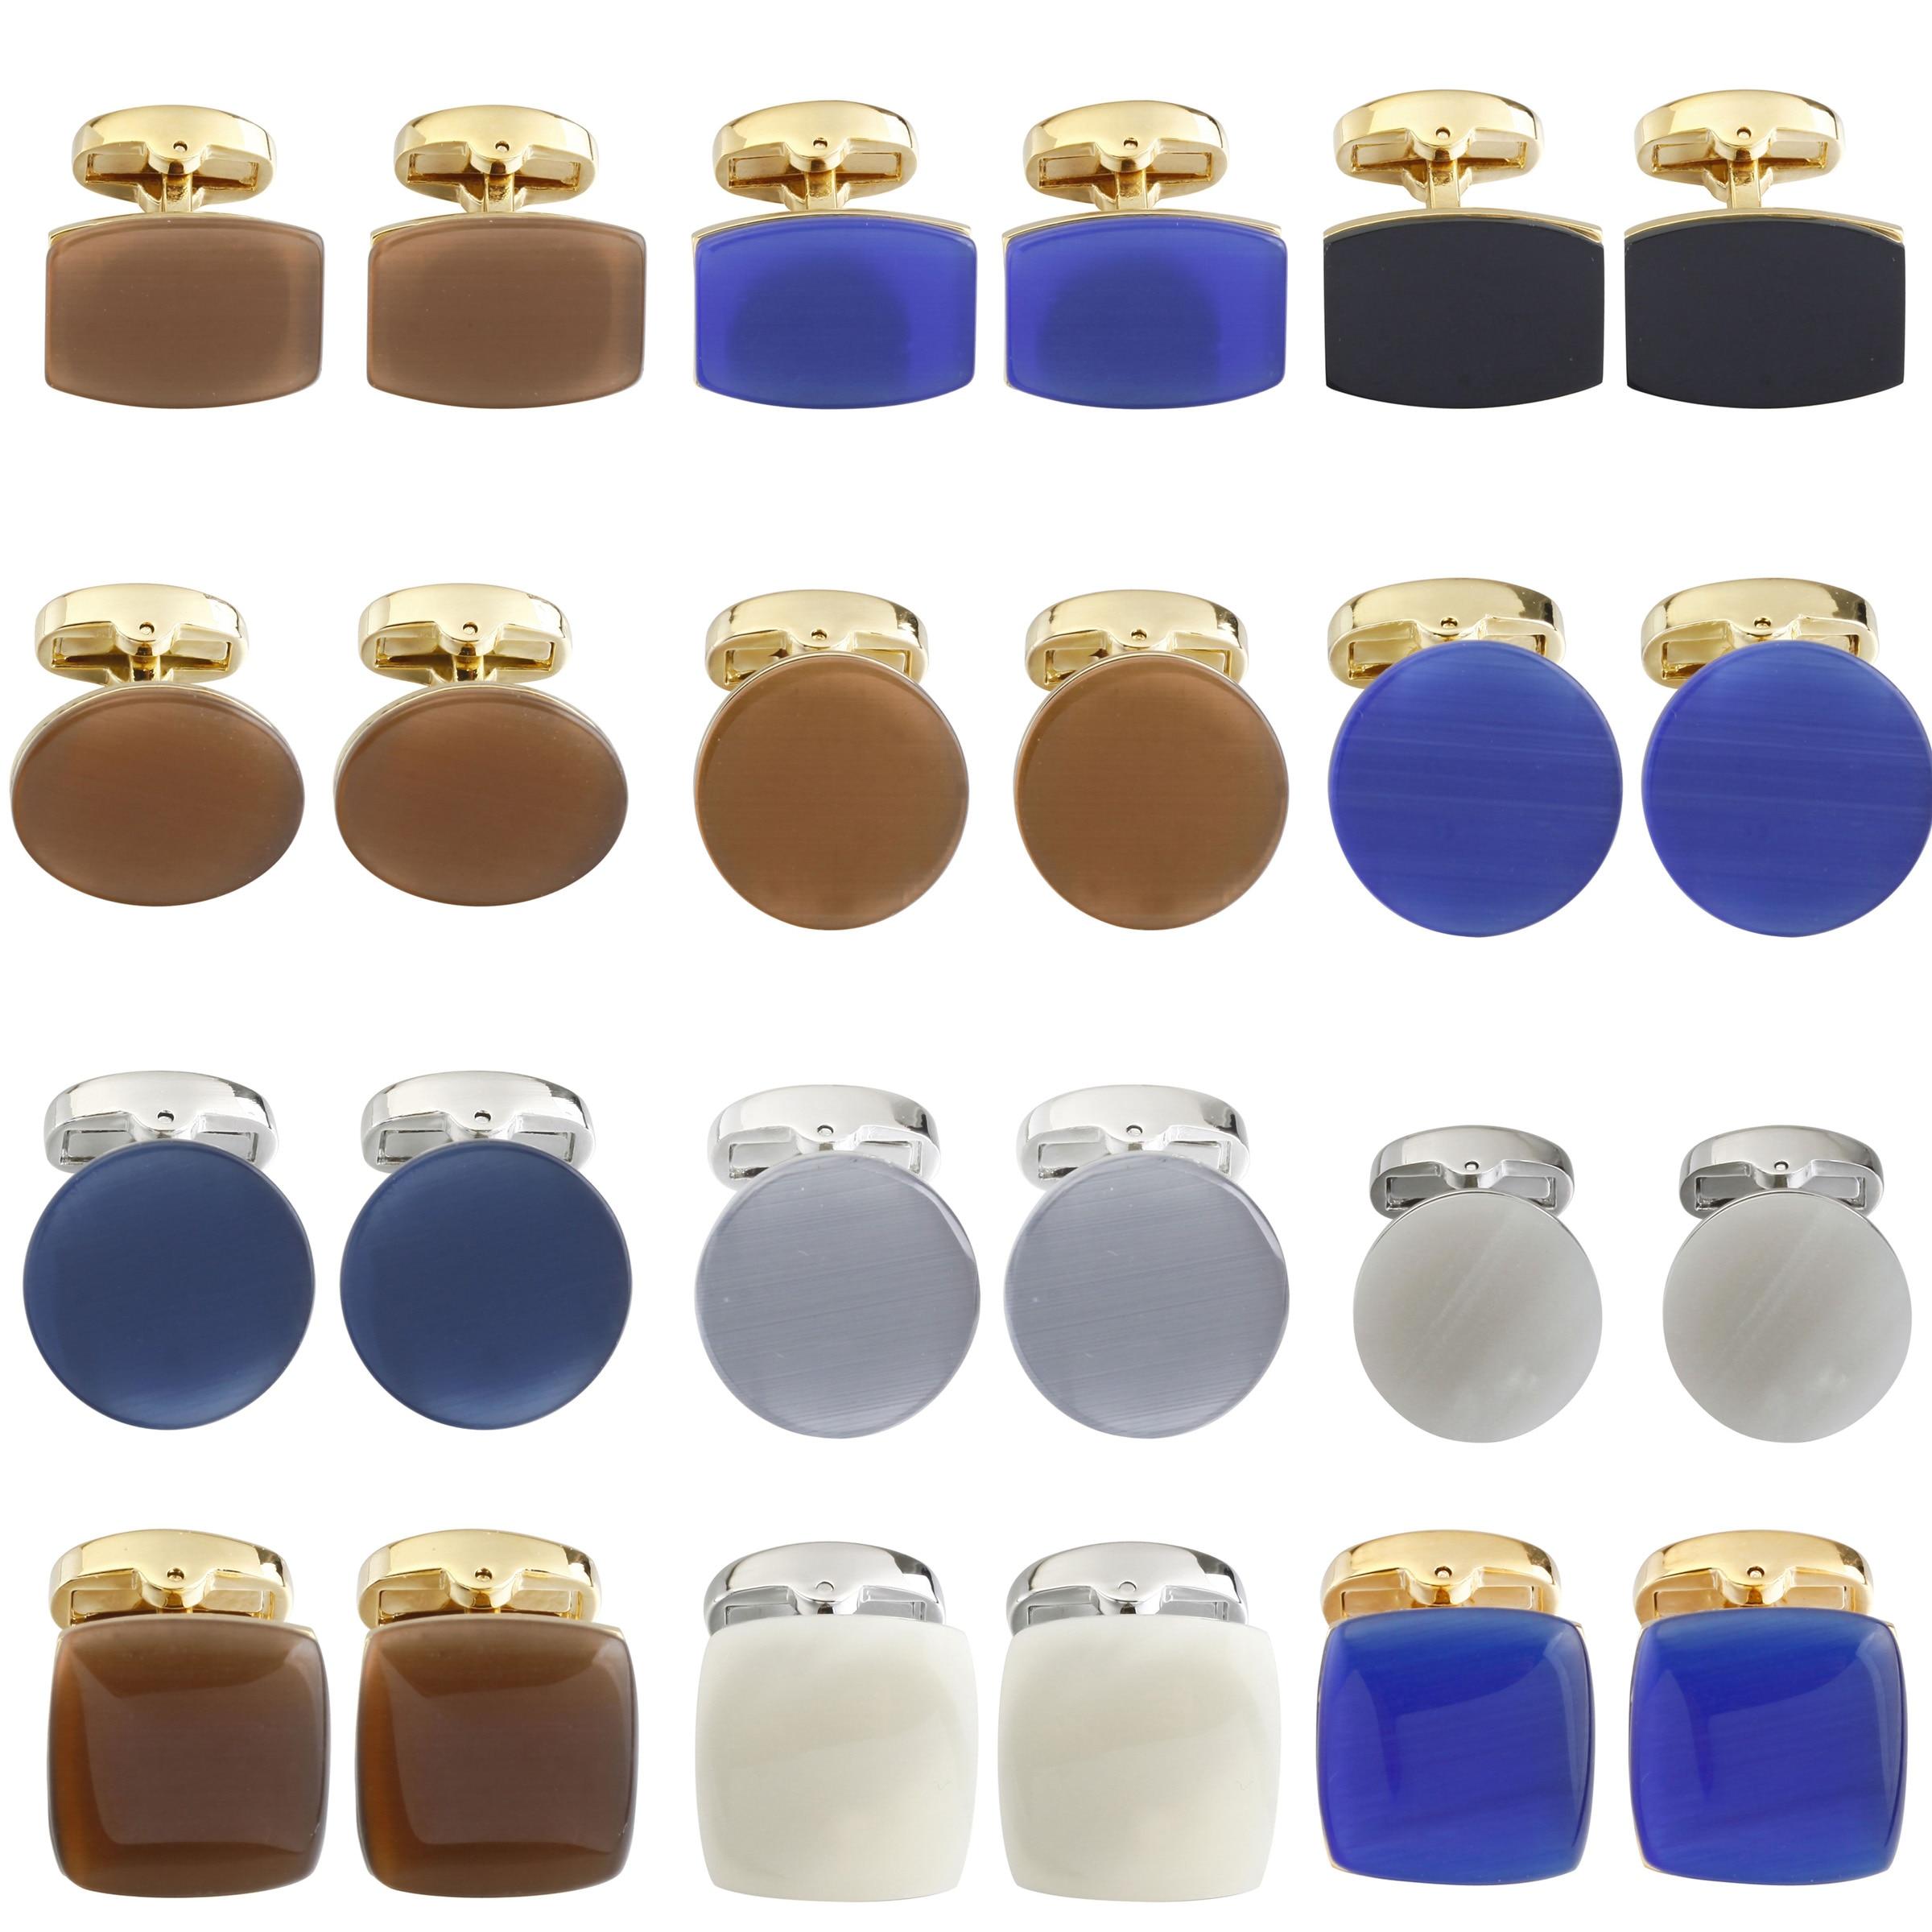 Ronde/Vierkante Gem Hand Made Manchetknopen Voor Heren Kleur Cat S Eye Manchetknopen Designer Merk Gemelos Para Hombre camisa